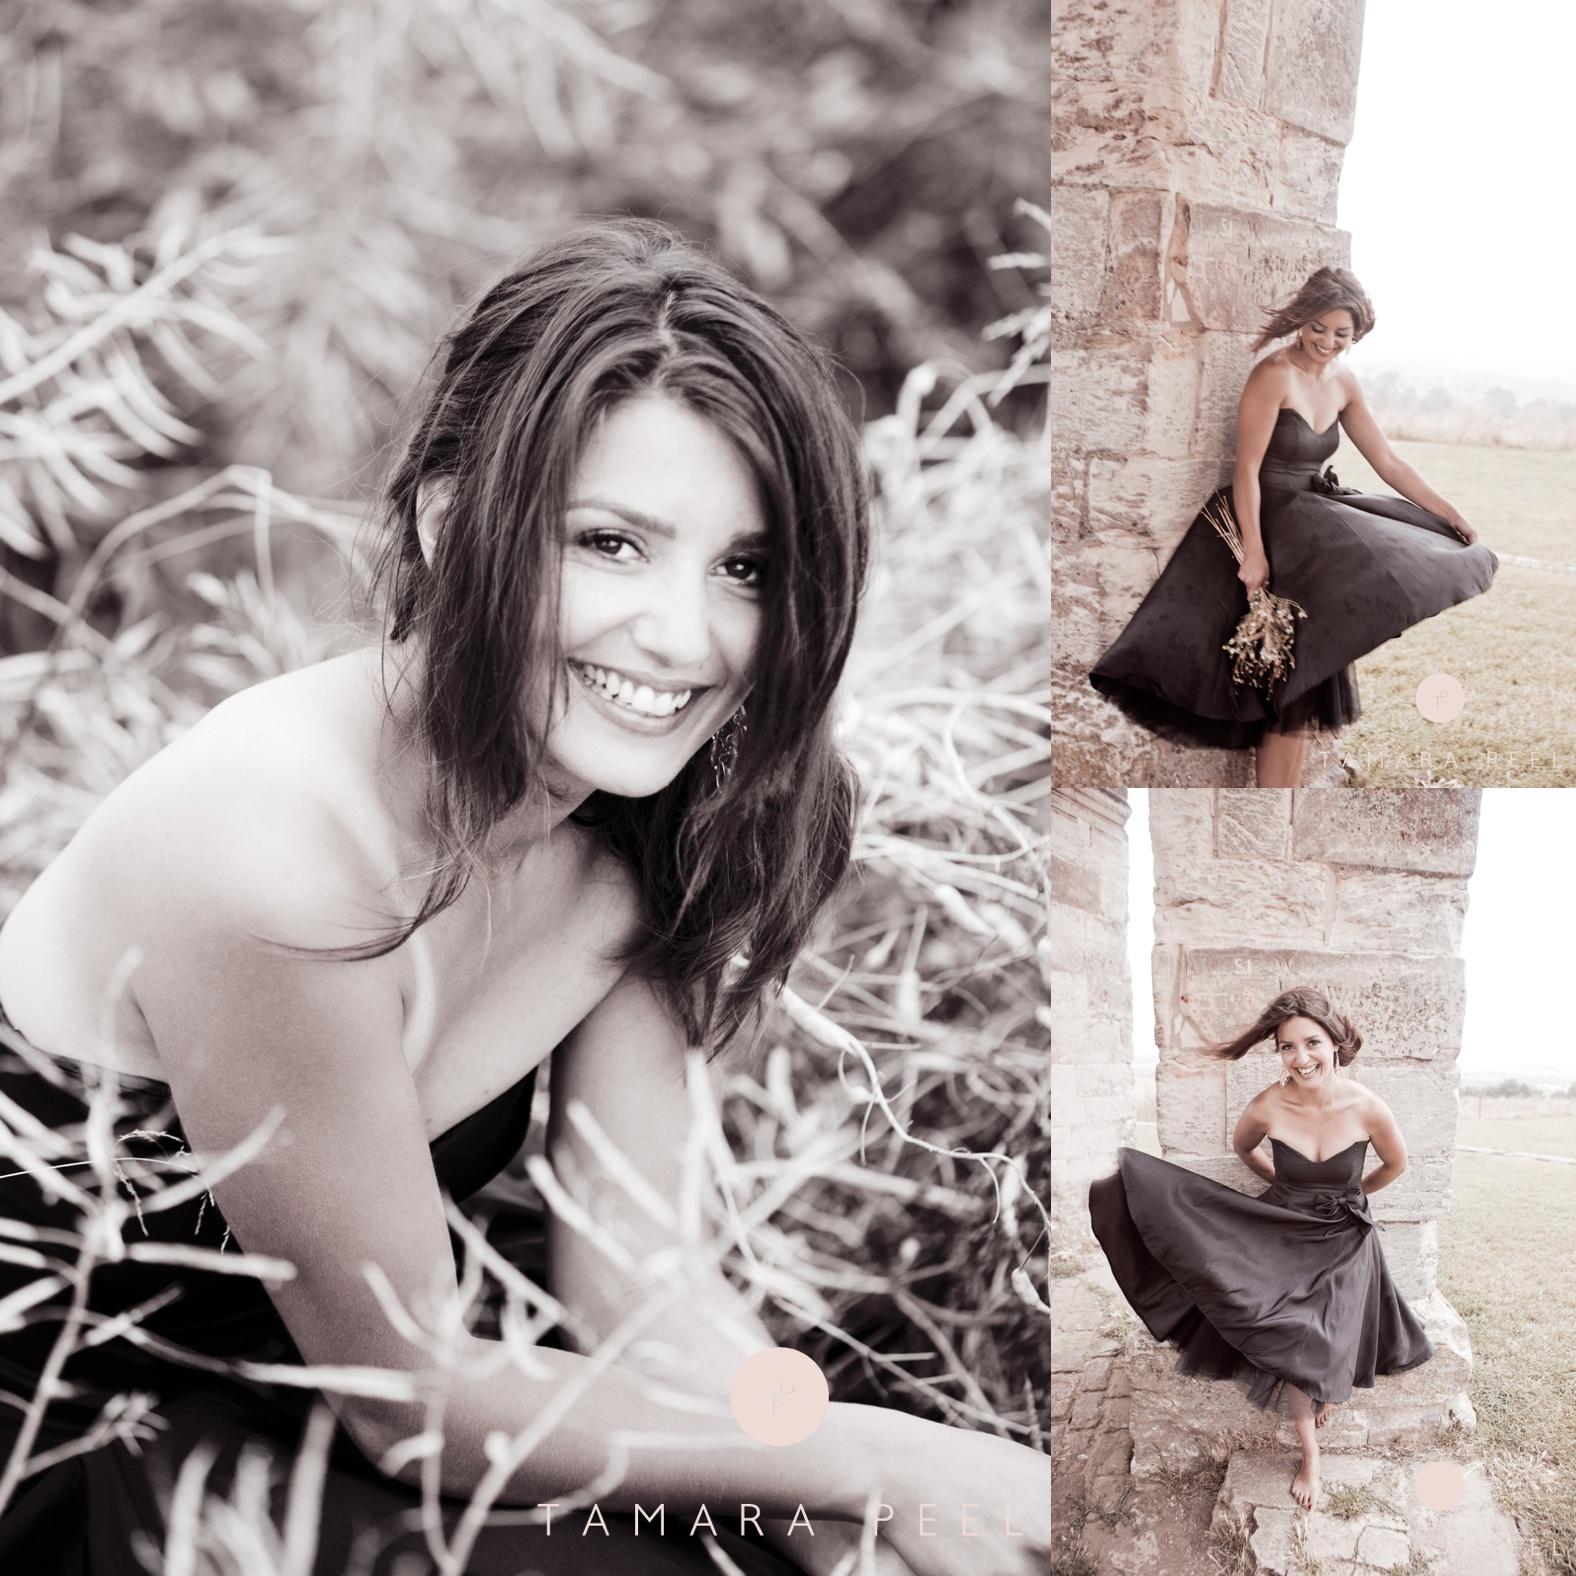 Tamara Peel. V,Macken,photographer,female_0110